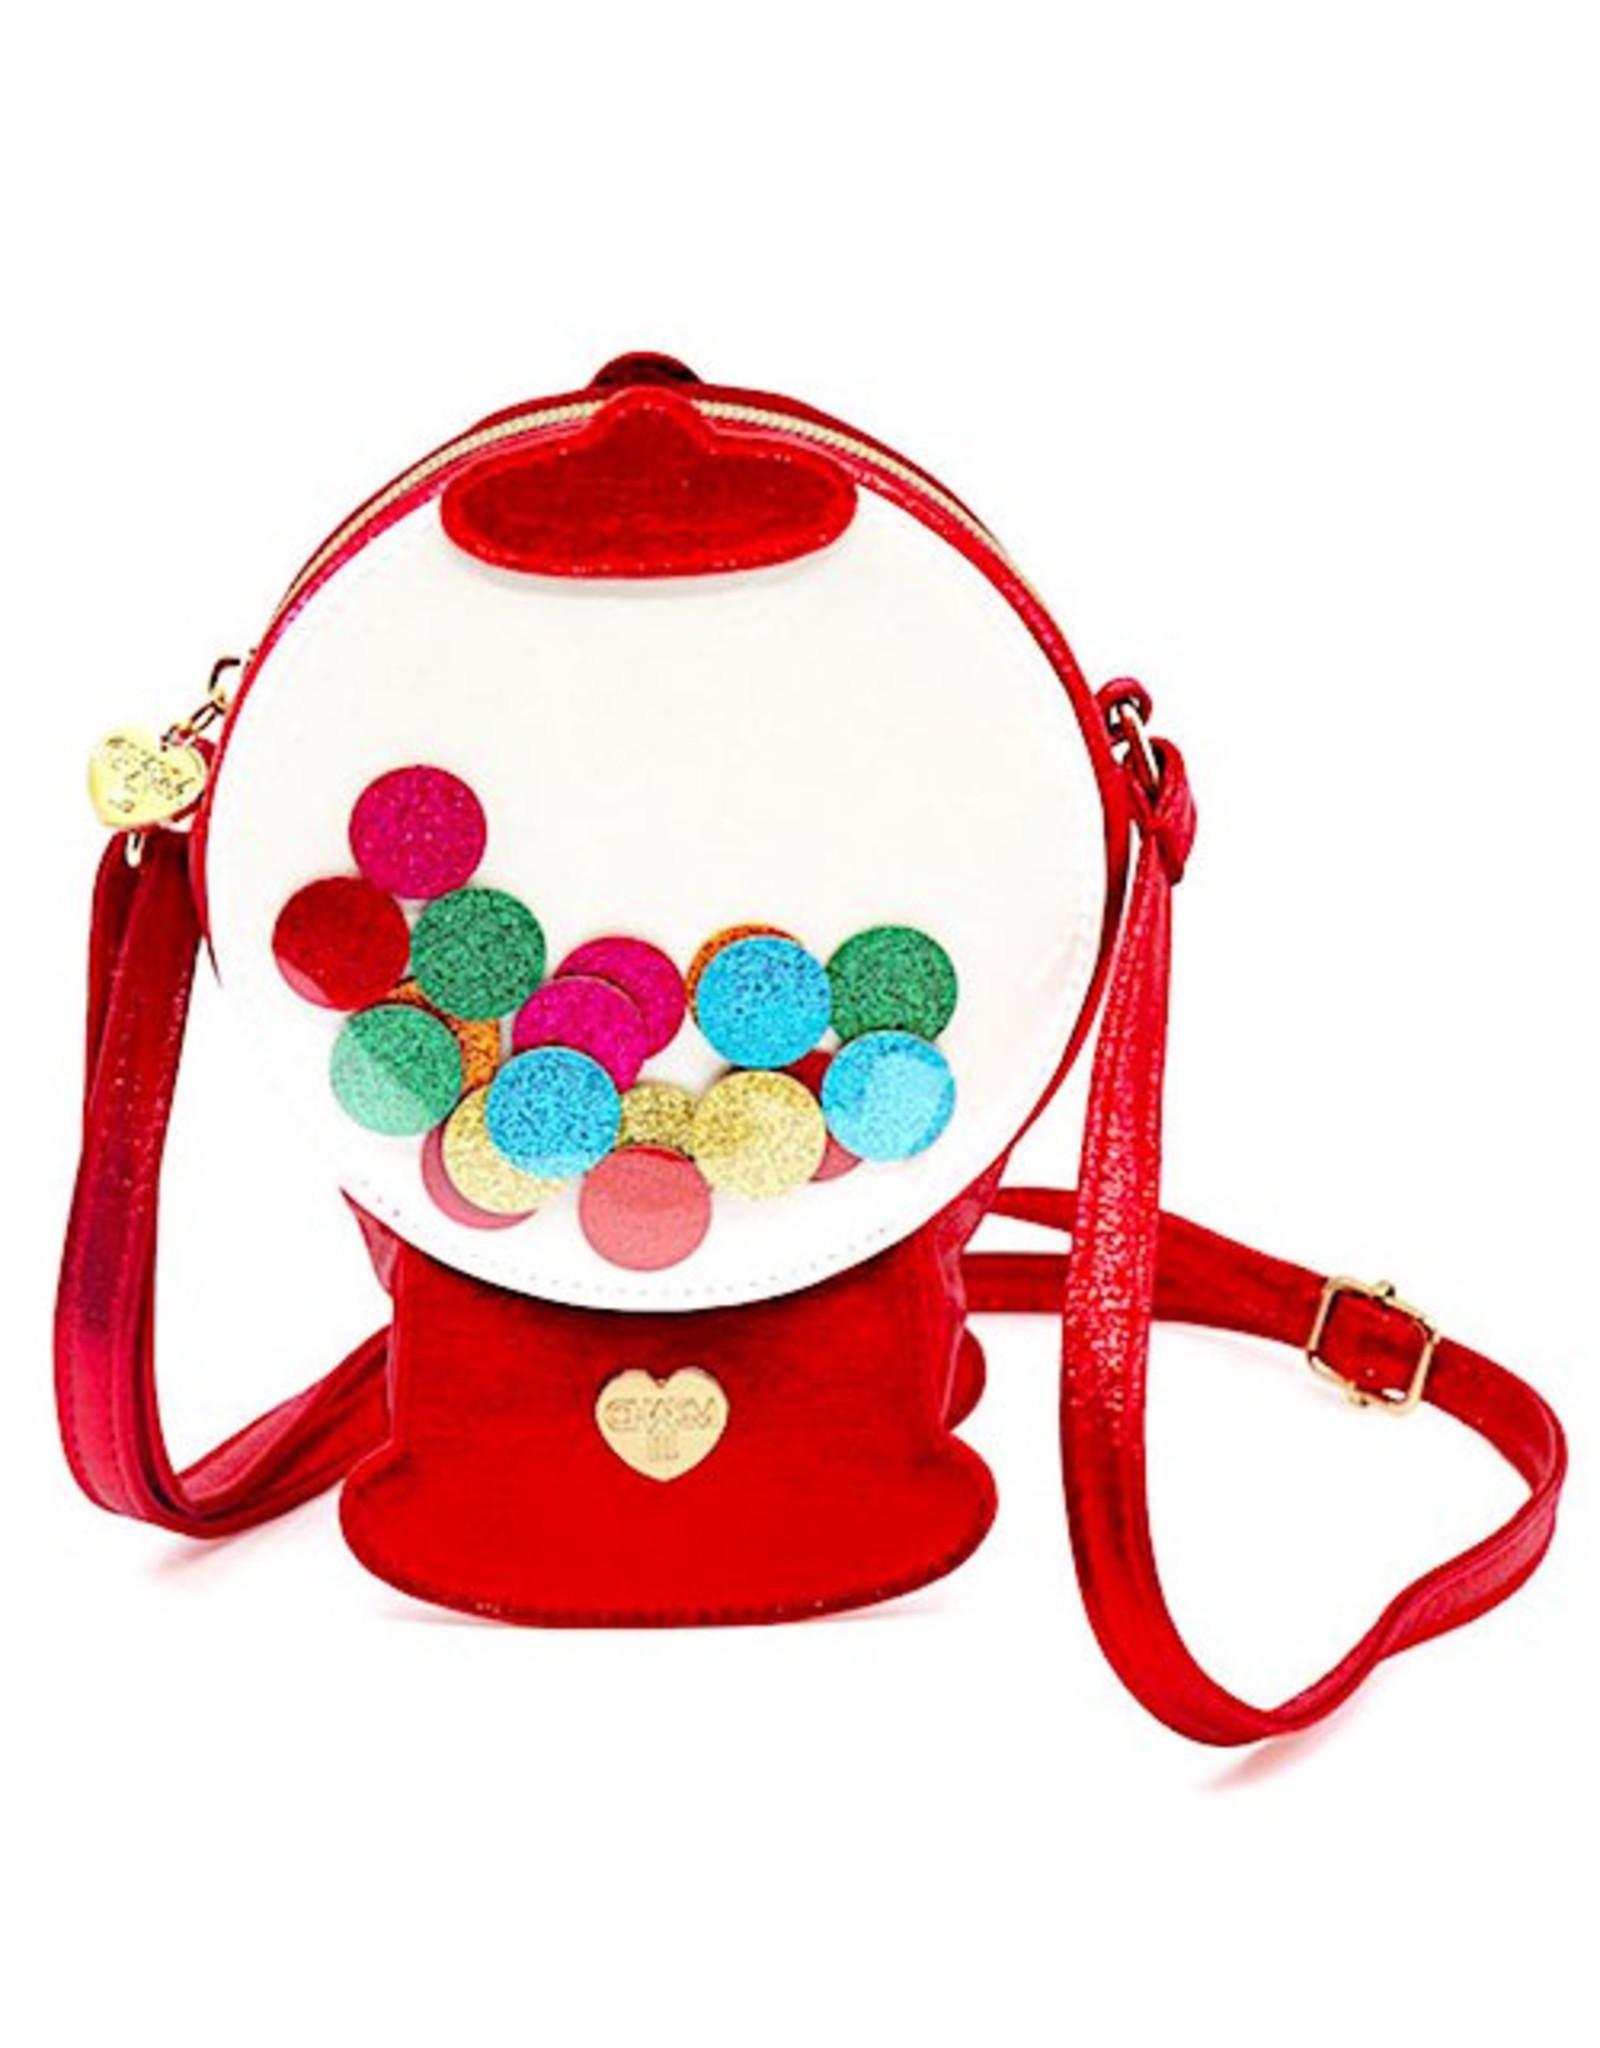 Charm IT Charm It! Gumball Machine Charm Bag